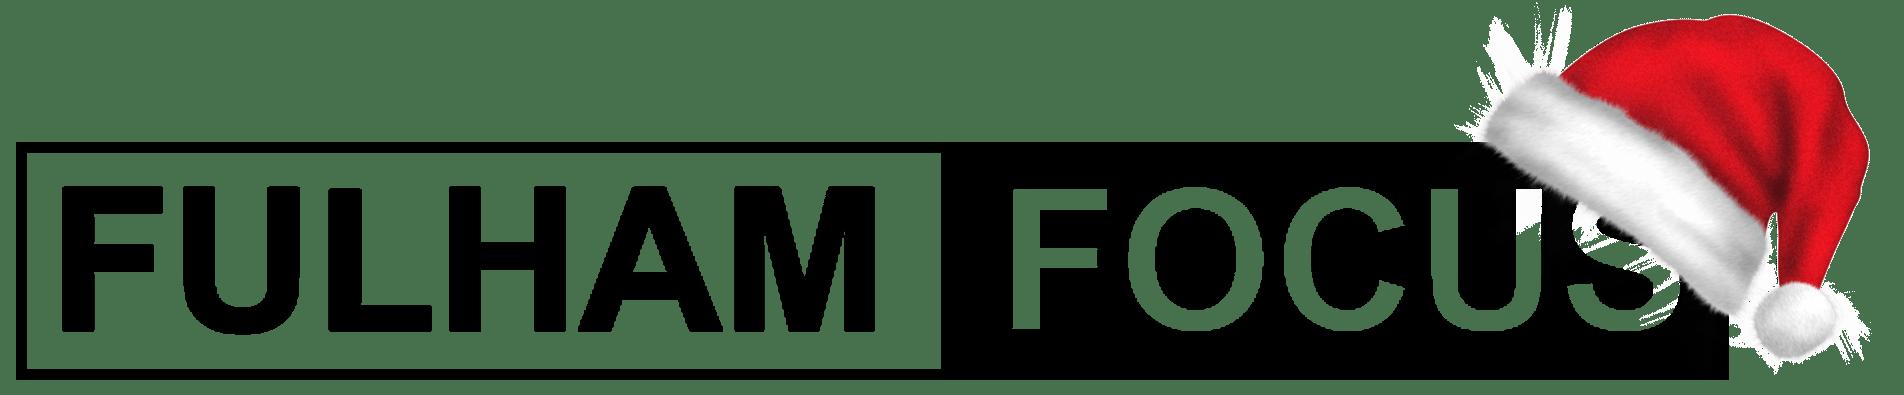 cropped-ff_logo_xmas.png